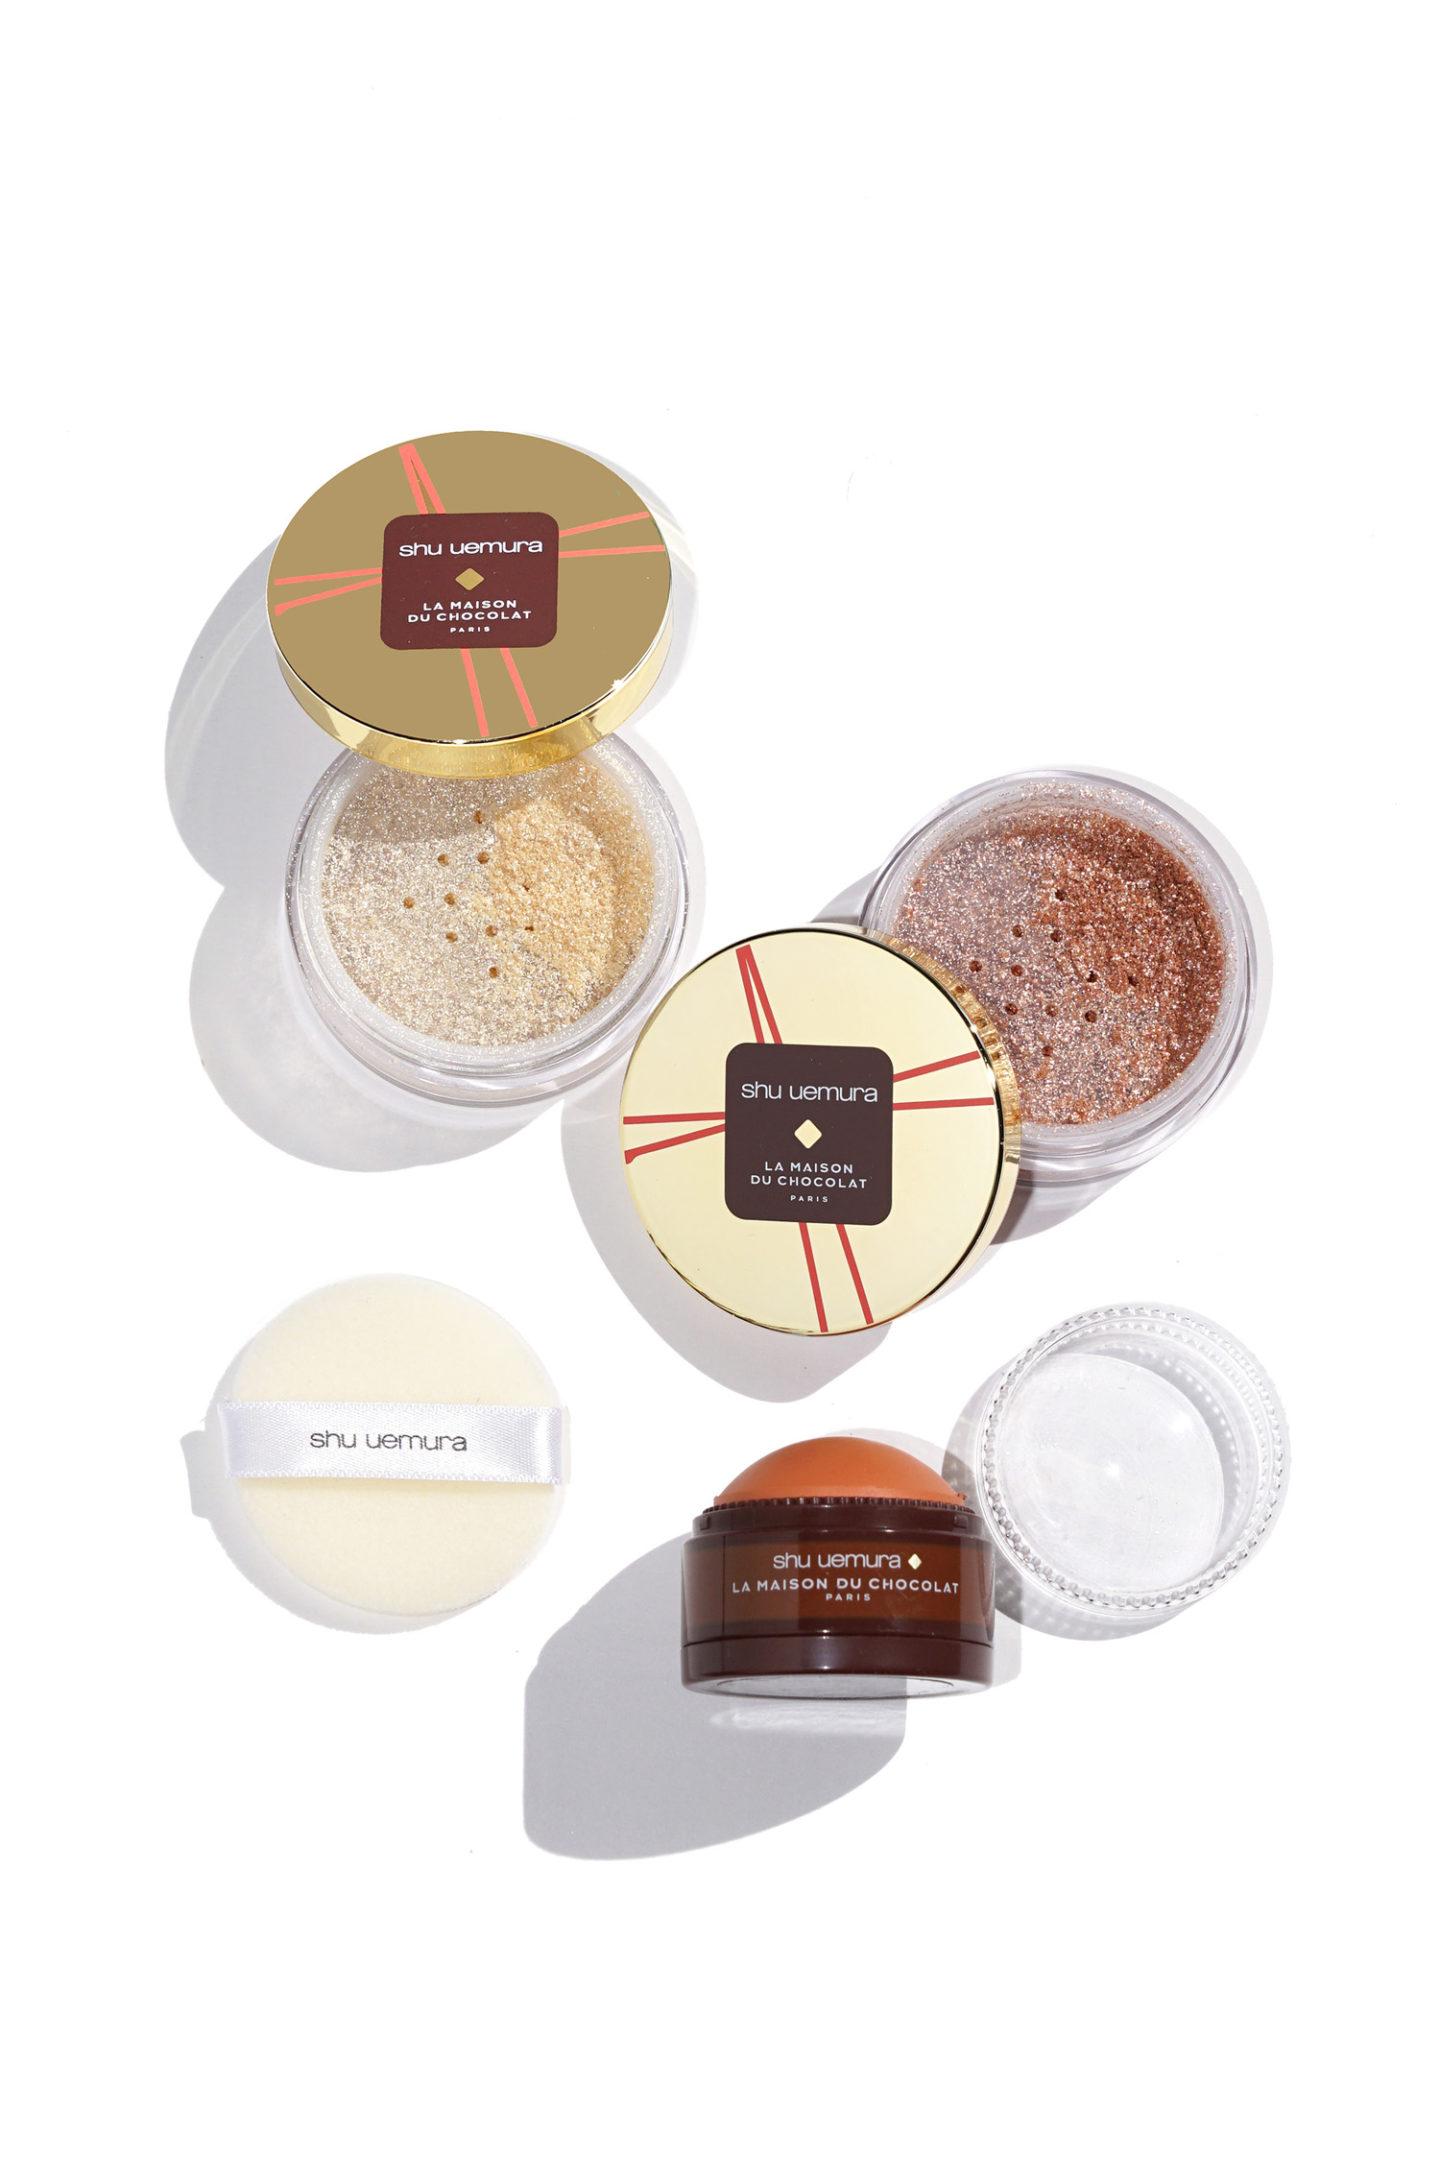 Nuancier Shu Uemura Shimmer Poudre et Creamy Dome Blush